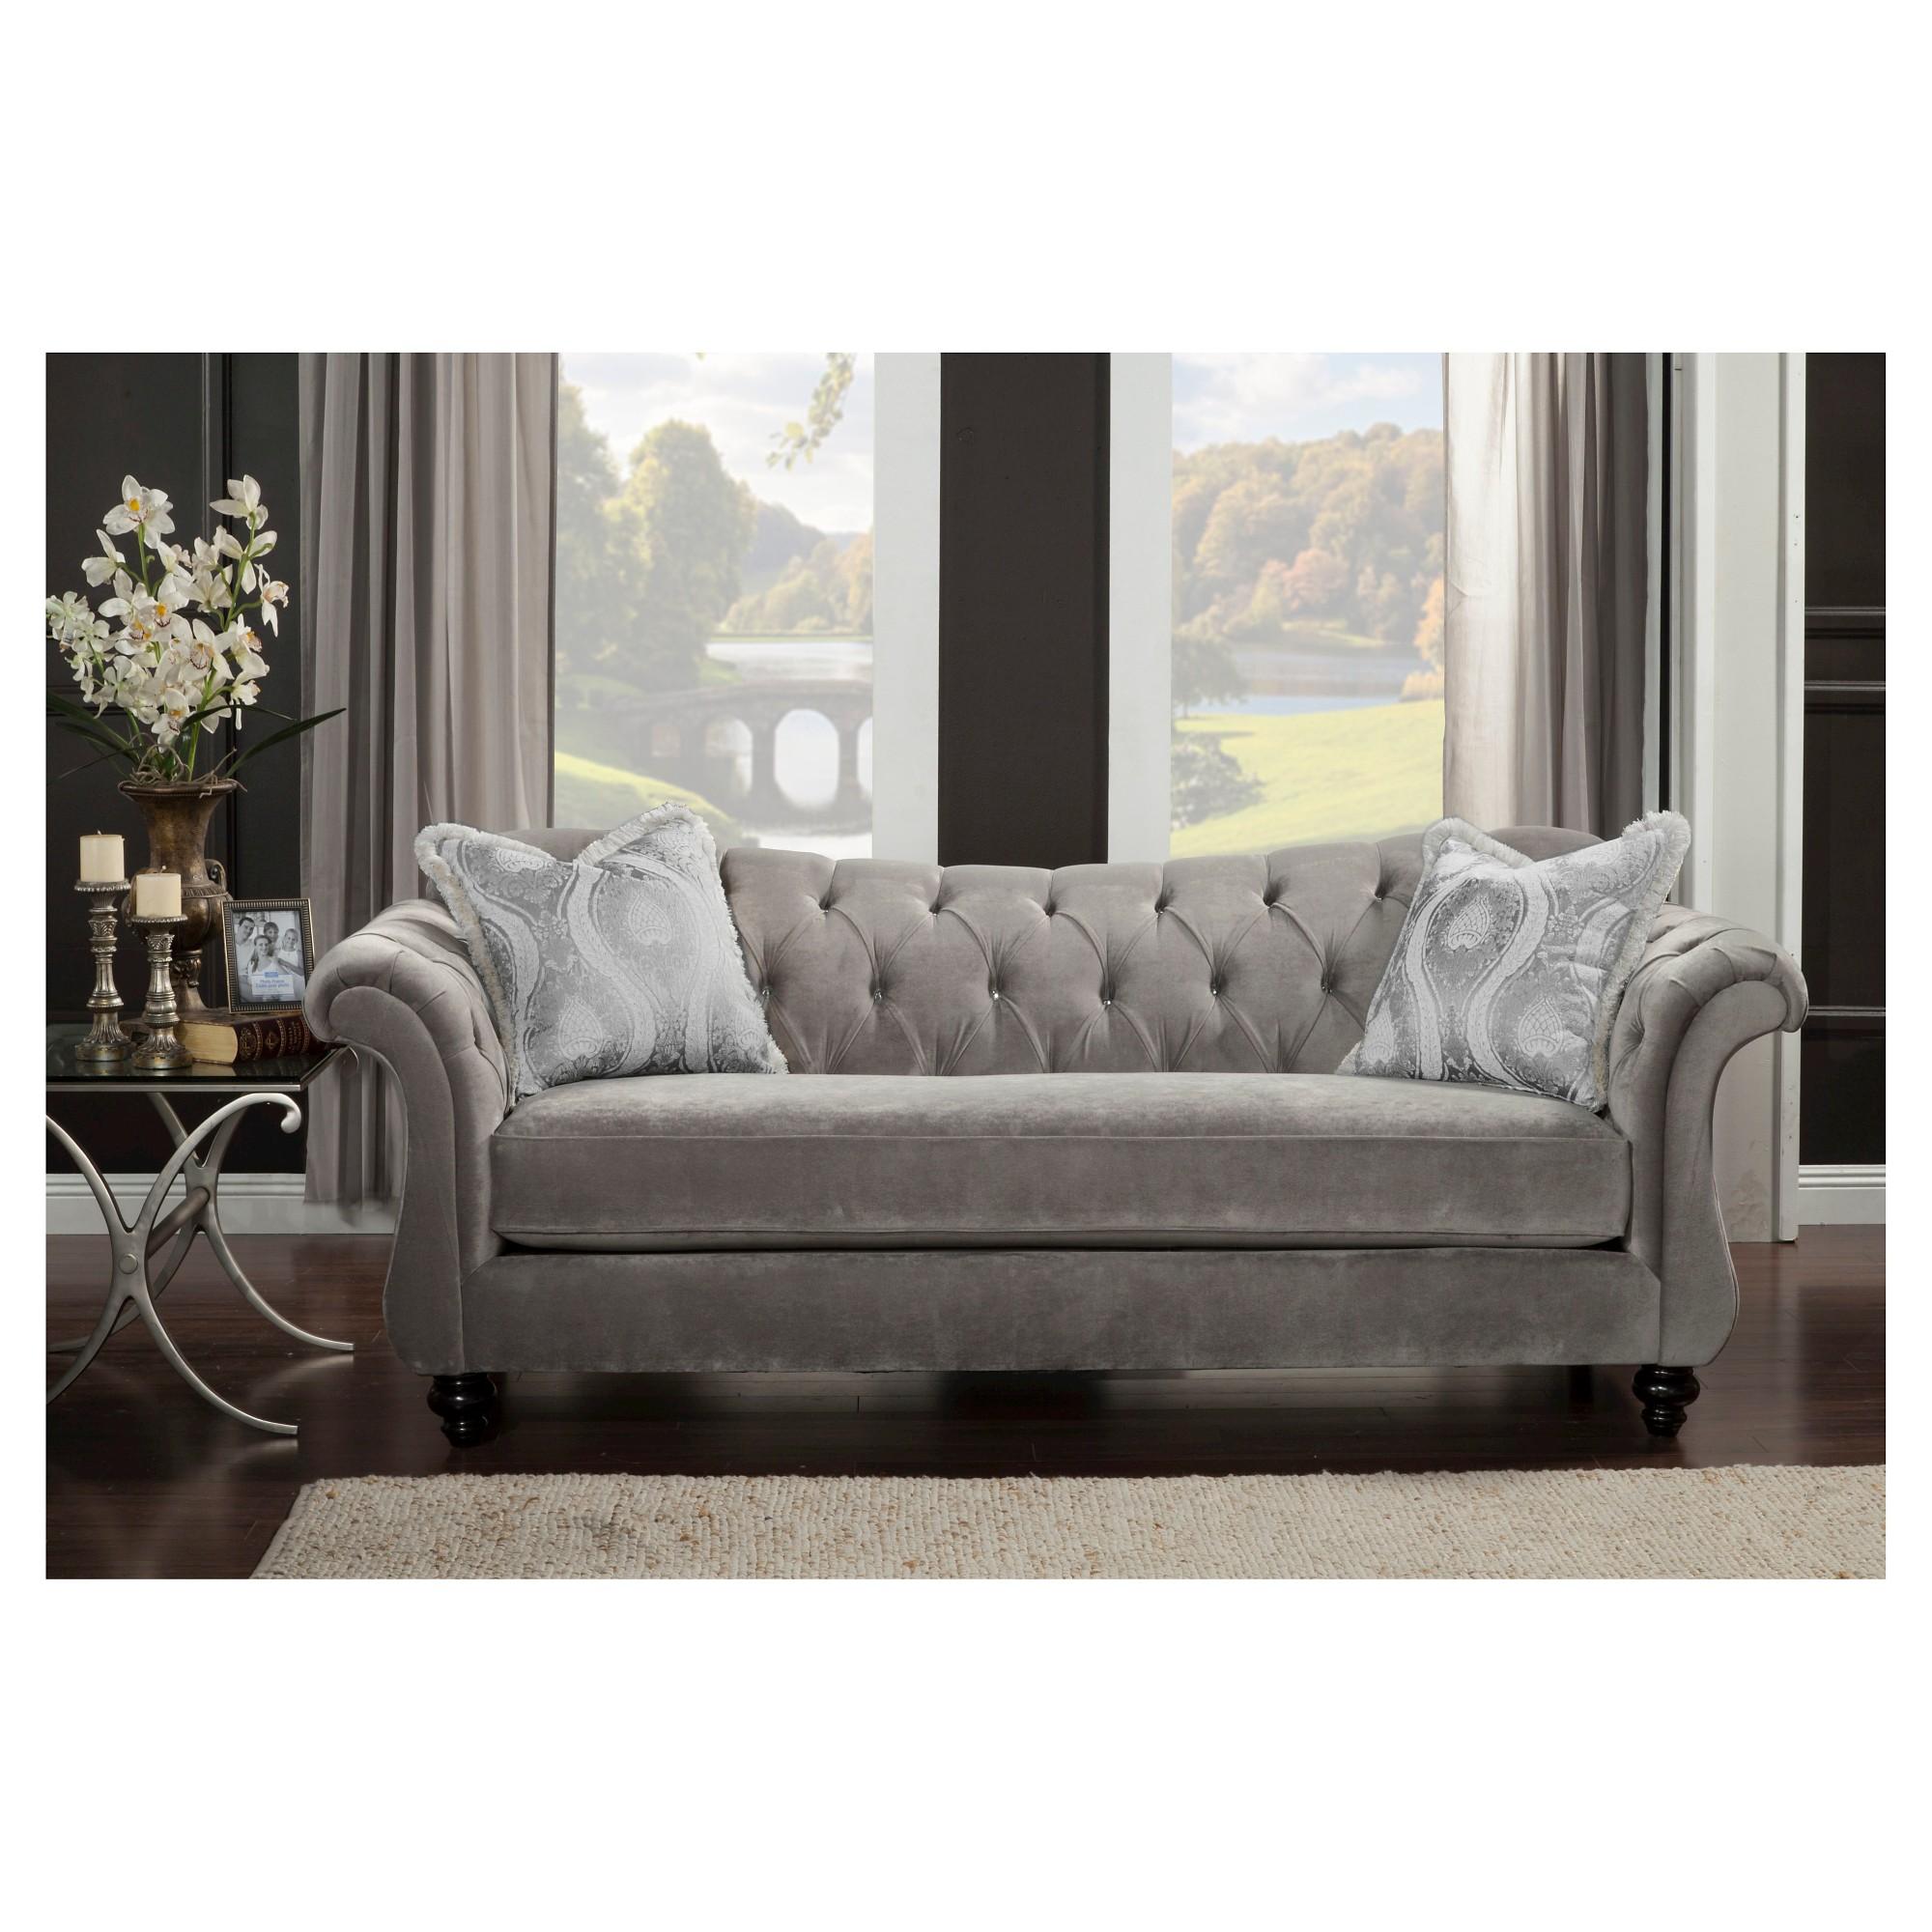 Alexandria Victorian Sofa Gray Iohomes Premium Sofa Victorian Sofa Furniture